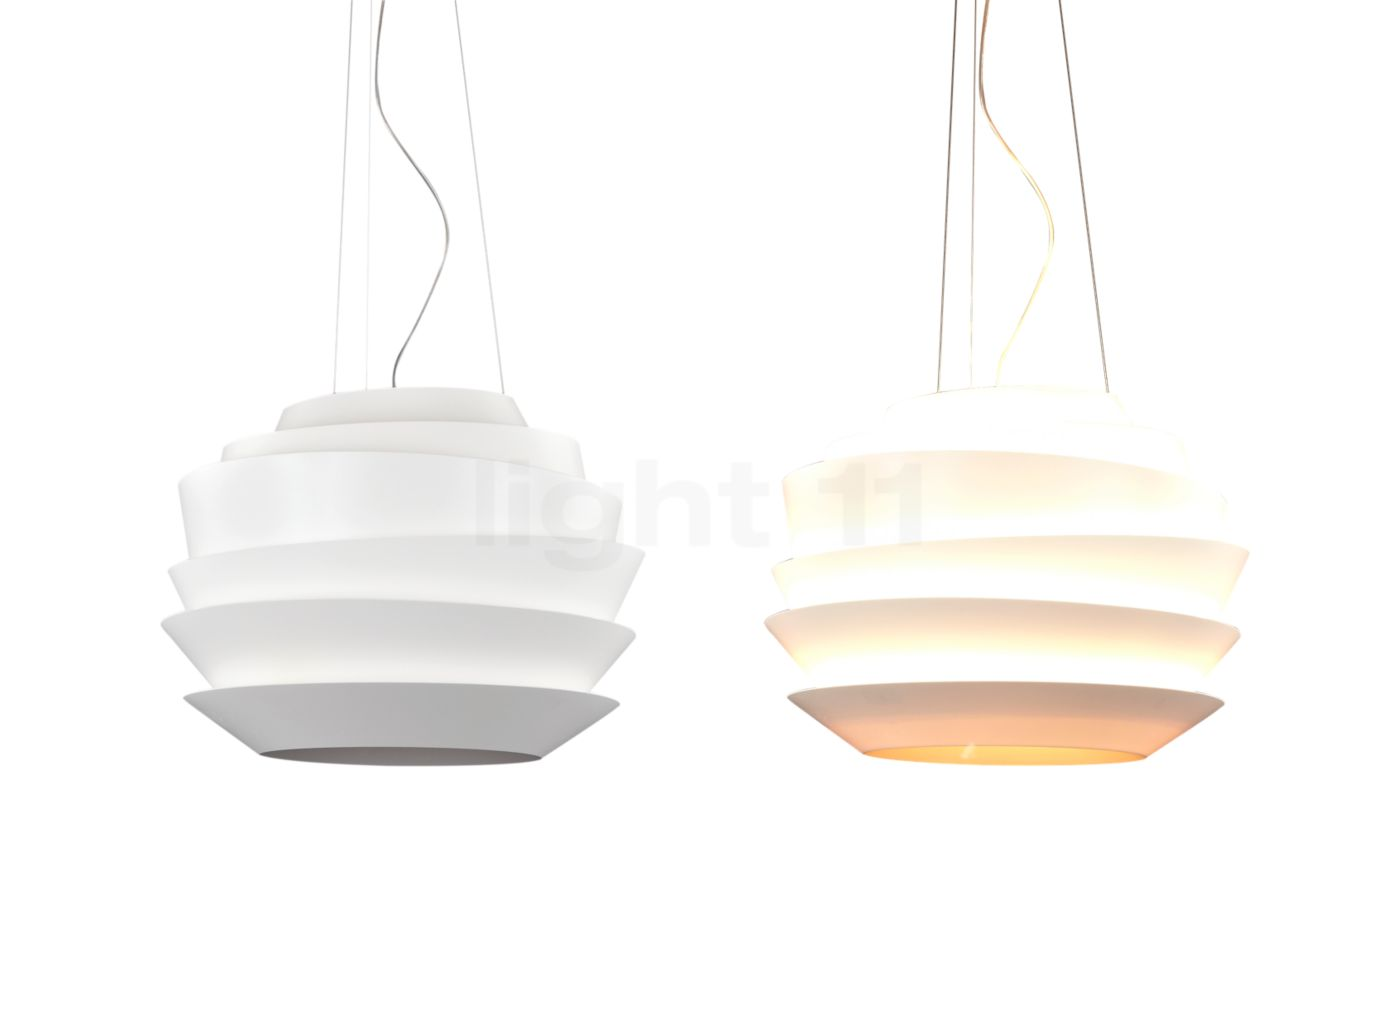 Foscarini Lampen Outlet : Foscarini le soleil sospensione kaufen bei light